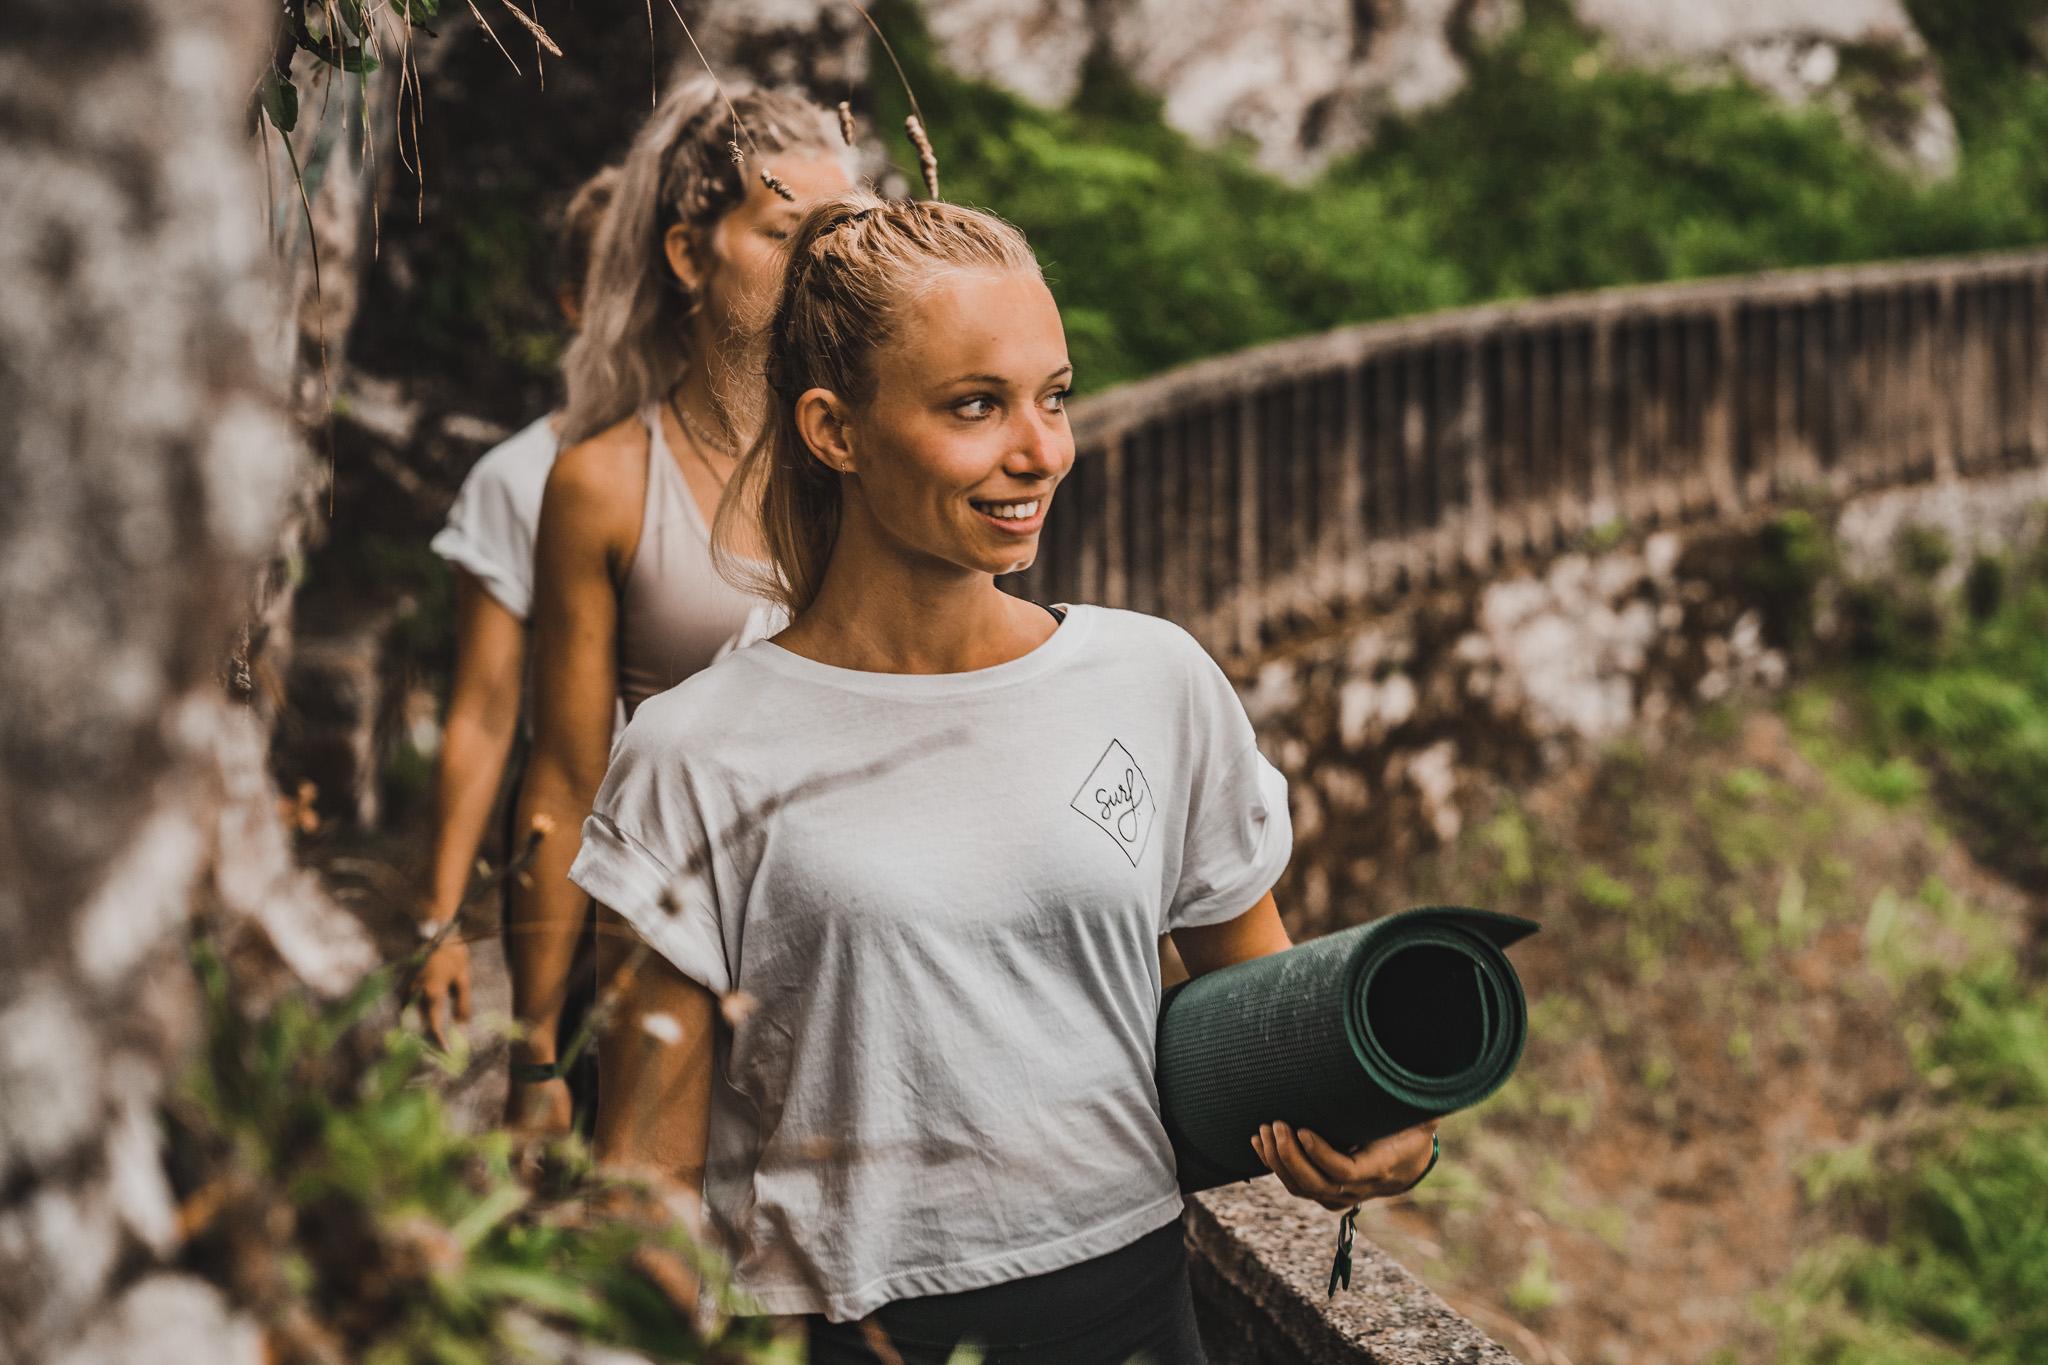 Bureau Duizenddingen Enter The wave Llanes Spanje 2020 Maithe van Luijk Yoga